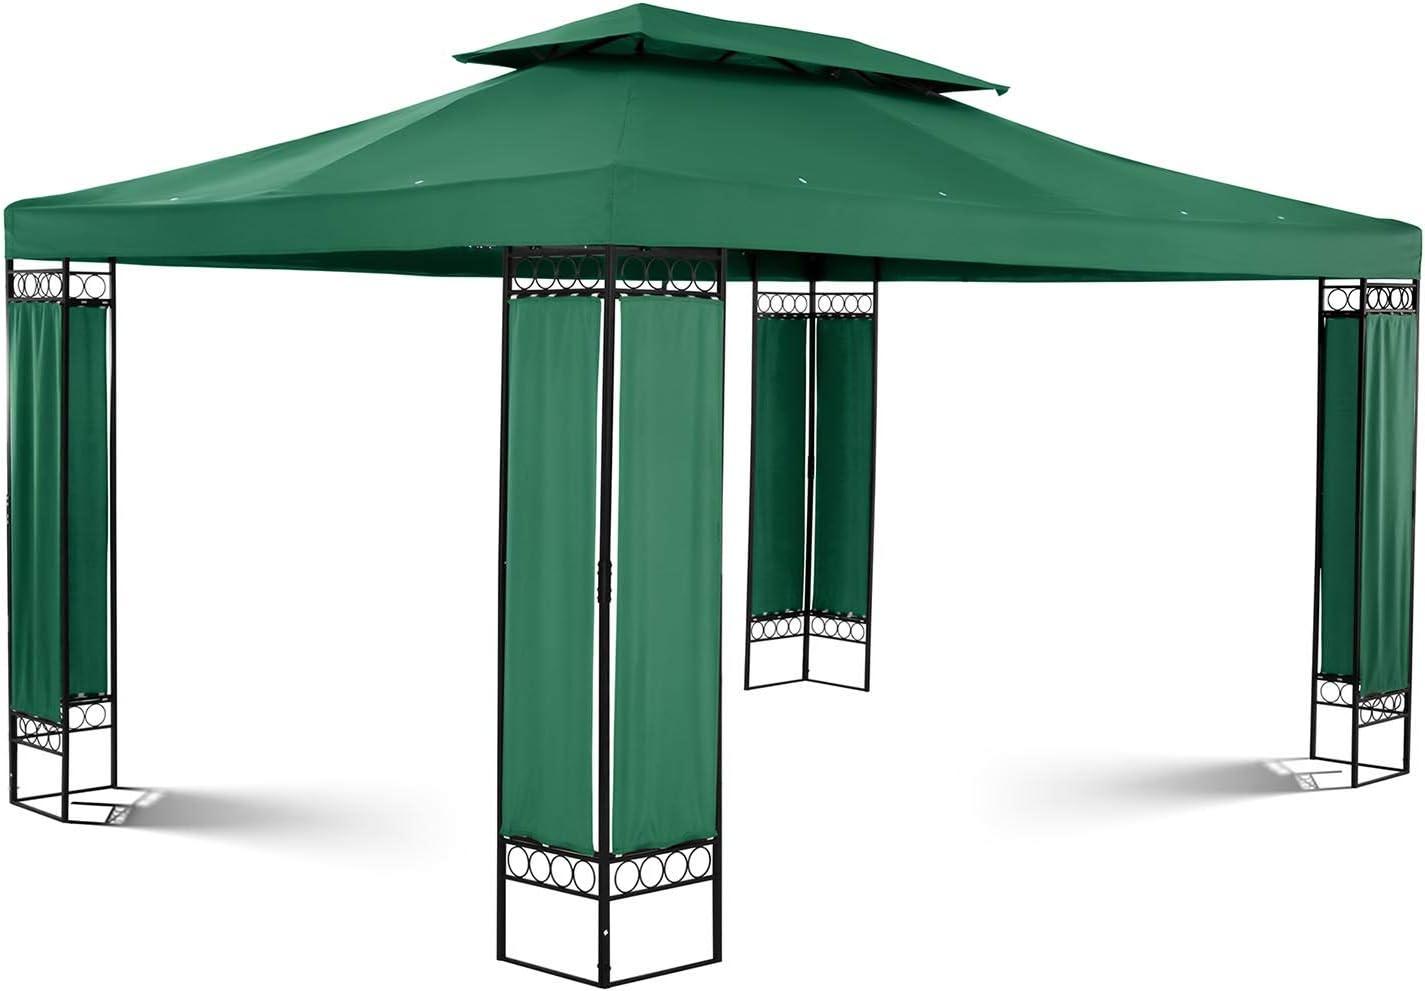 Uniprodo Pérgola De Metal Pabellón para Terraza Uni_PERGOLA_3X4GF (Toldo de 3 x 4 m, 160 g/m², Altura Total: 2, 60 m, Verde Oscuro): Amazon.es: Jardín